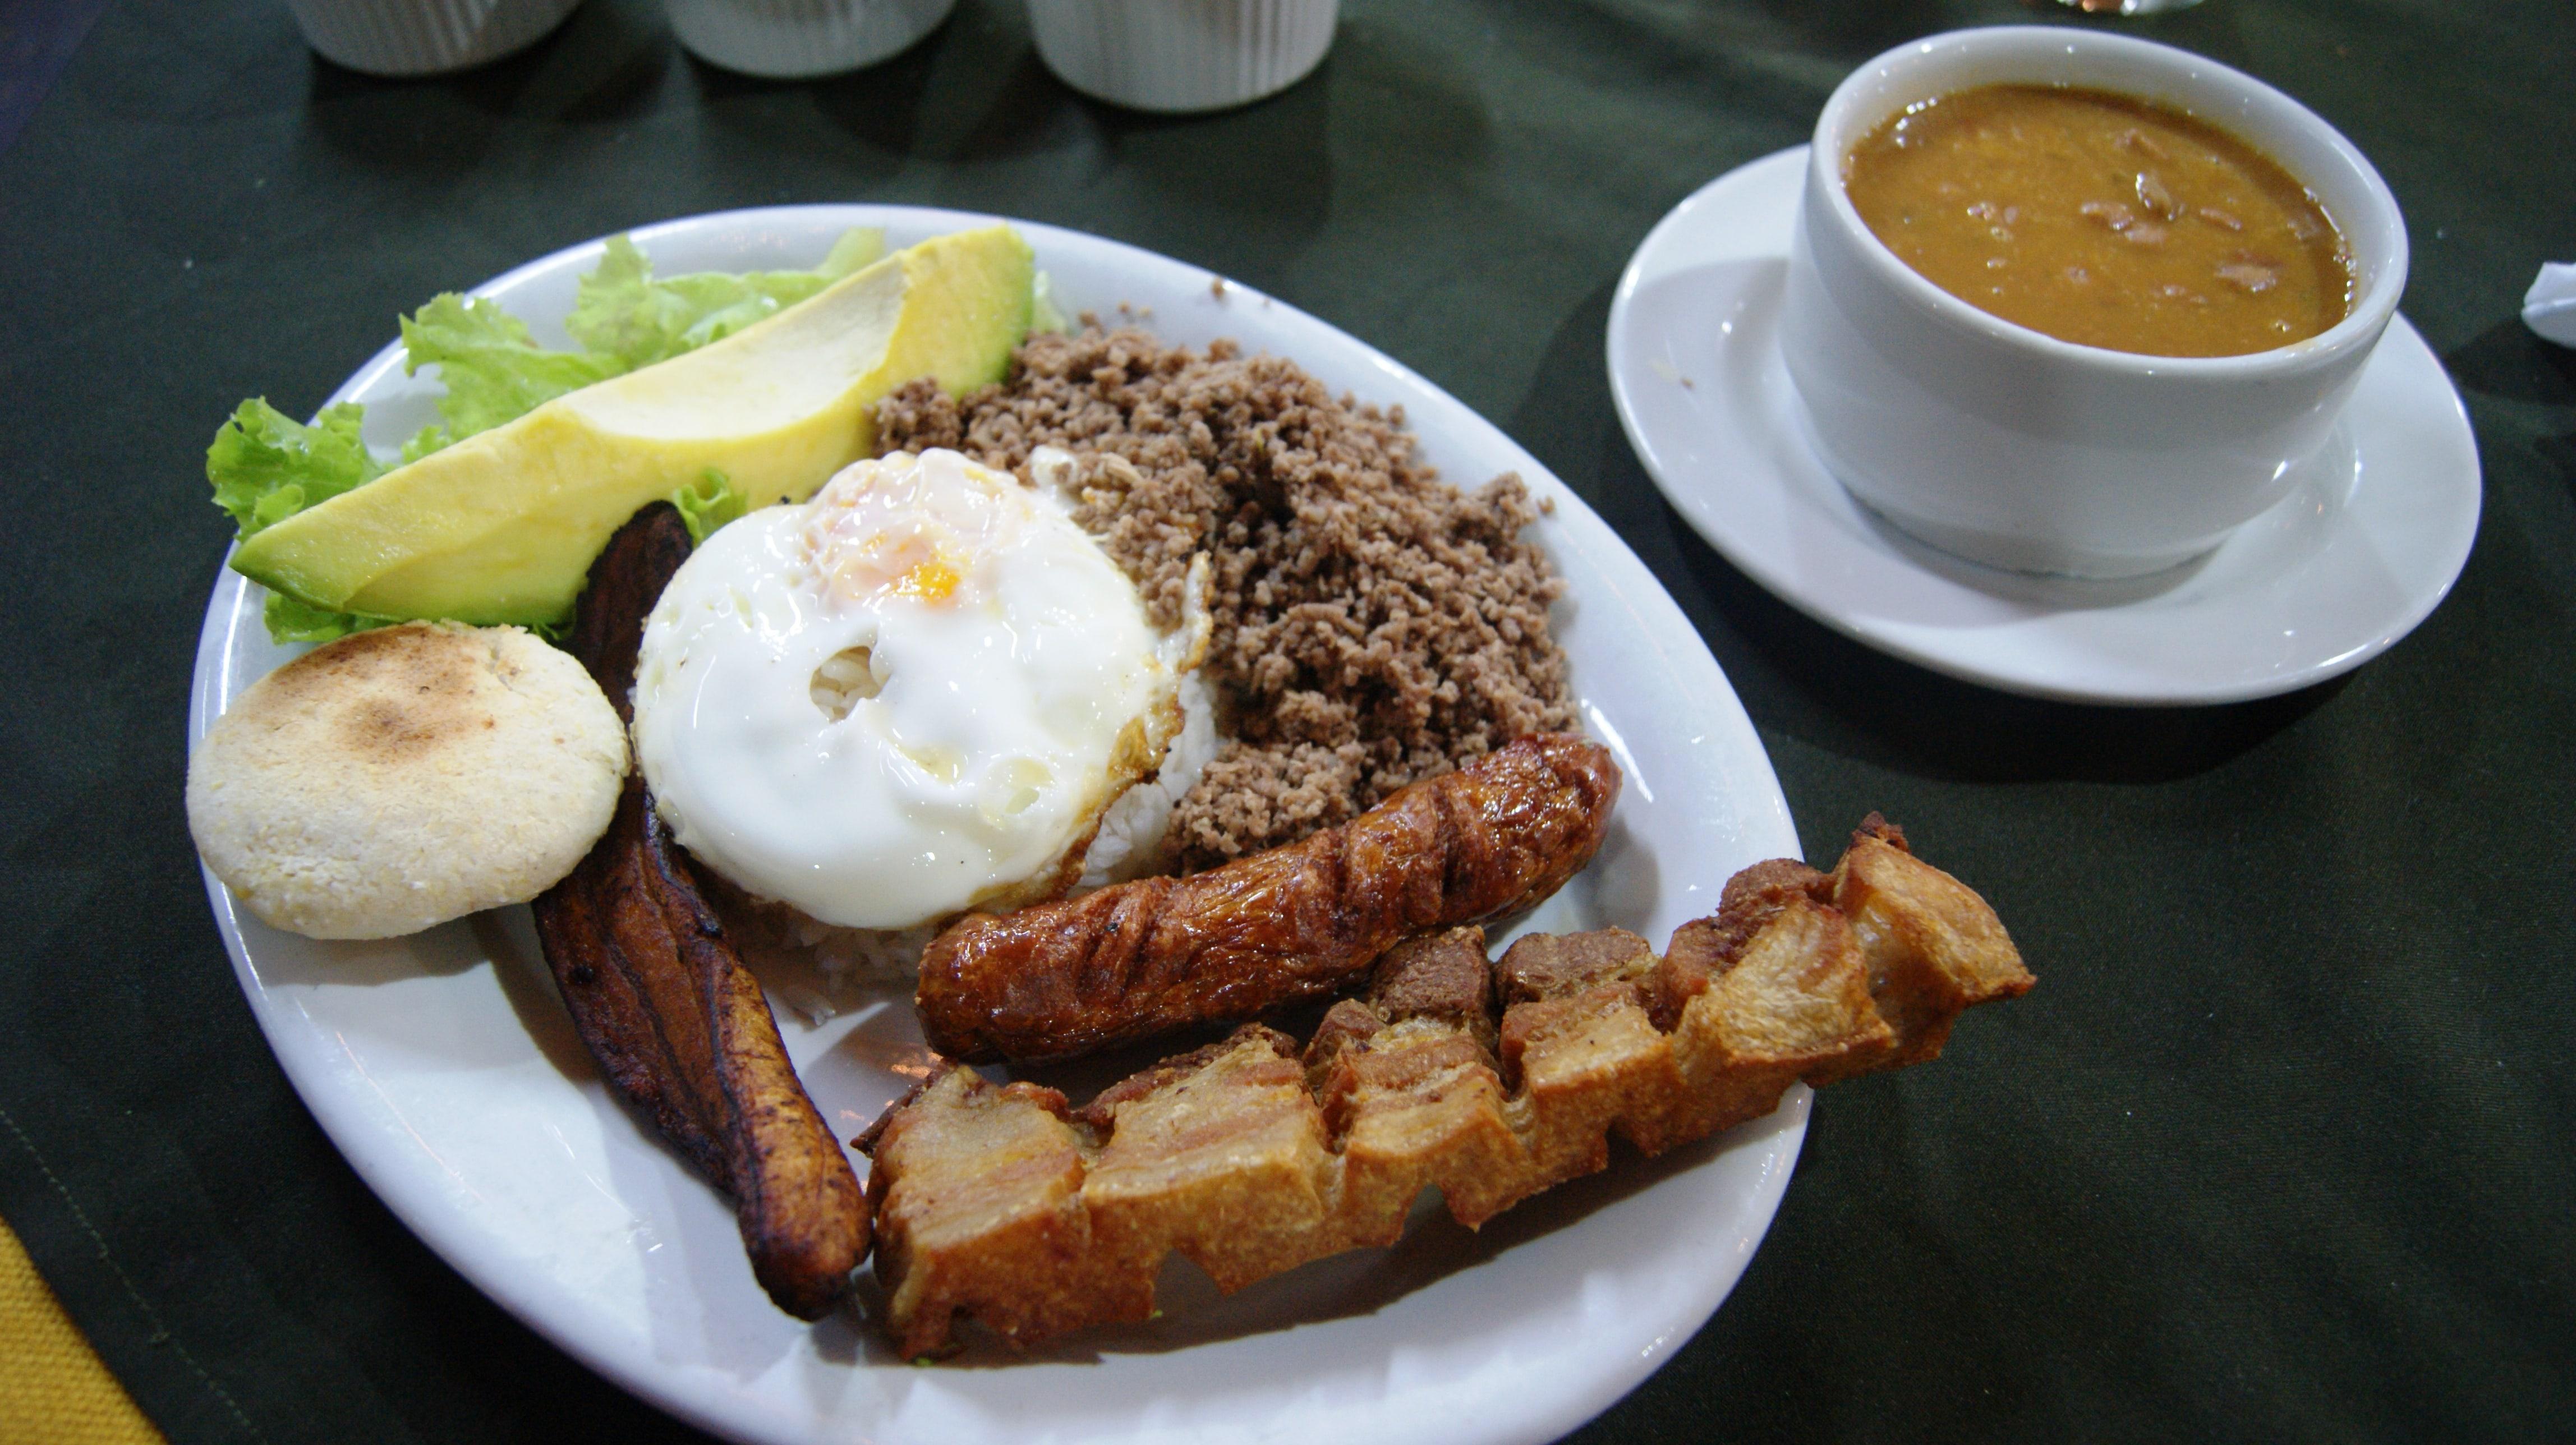 bandeja paisa in Medellin Colombia is great Colombian food